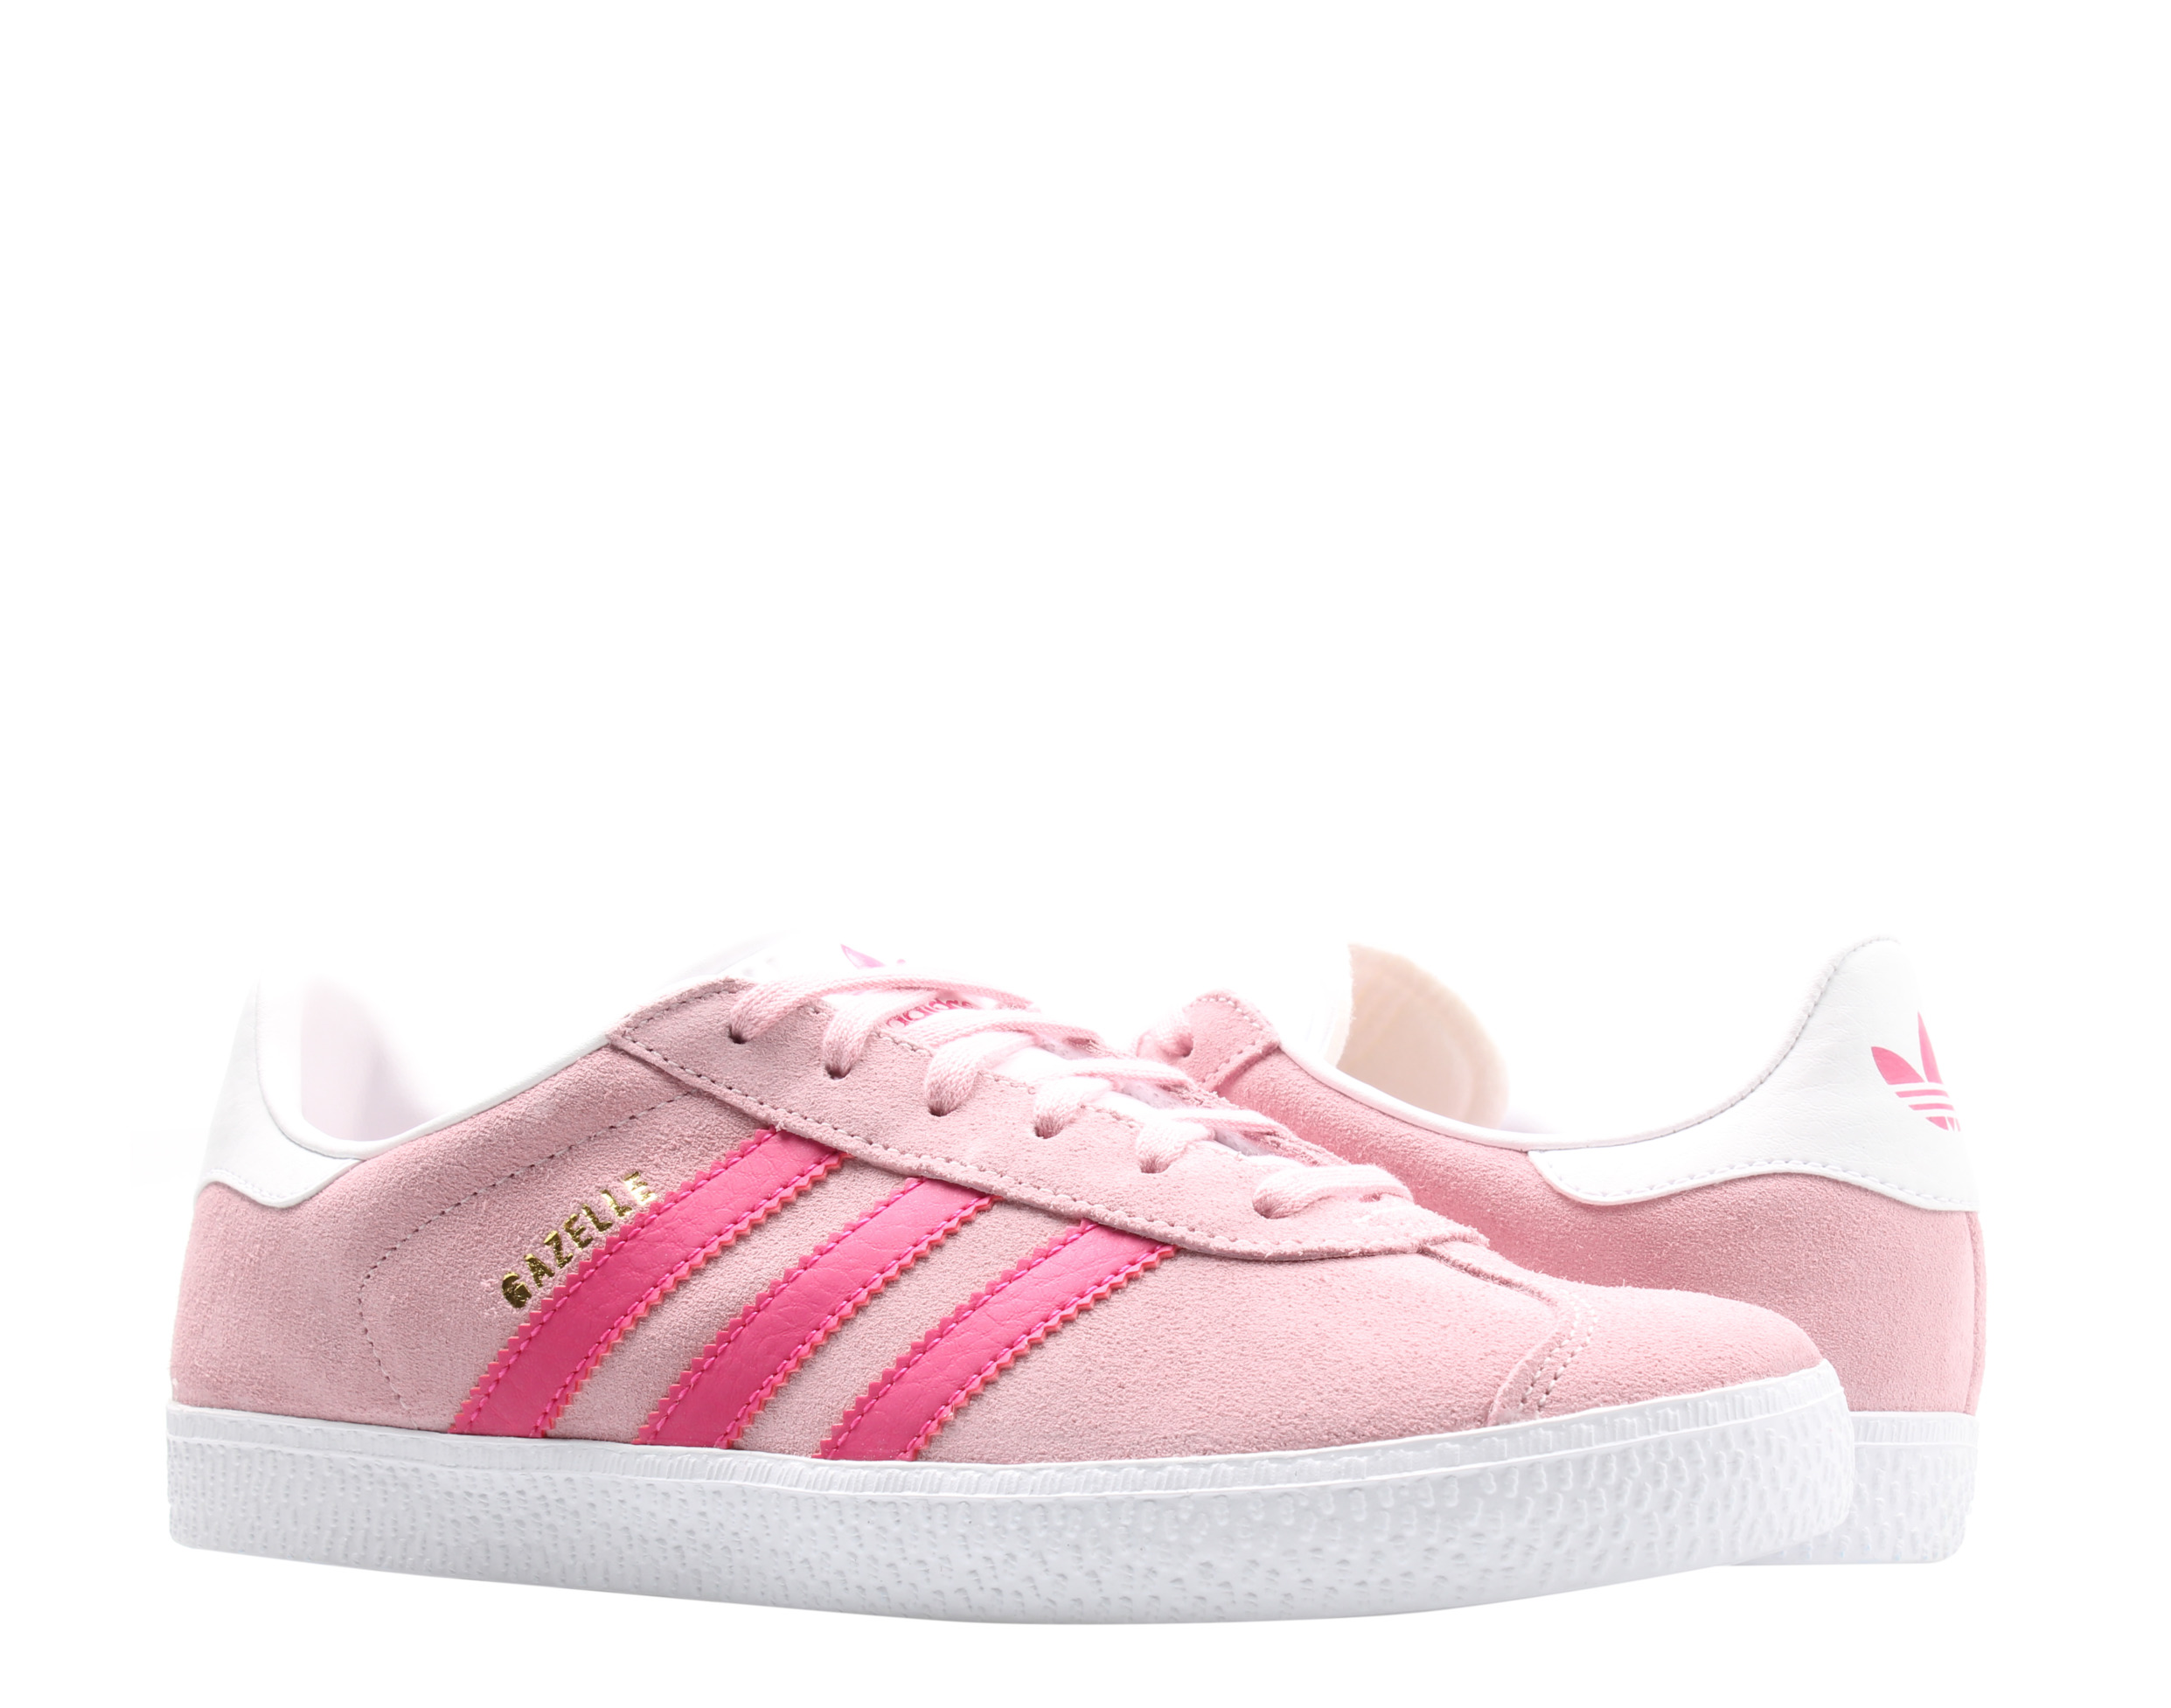 Adidas Originals Gazelle J Pink/Magenta/White Big Kids Casual ...